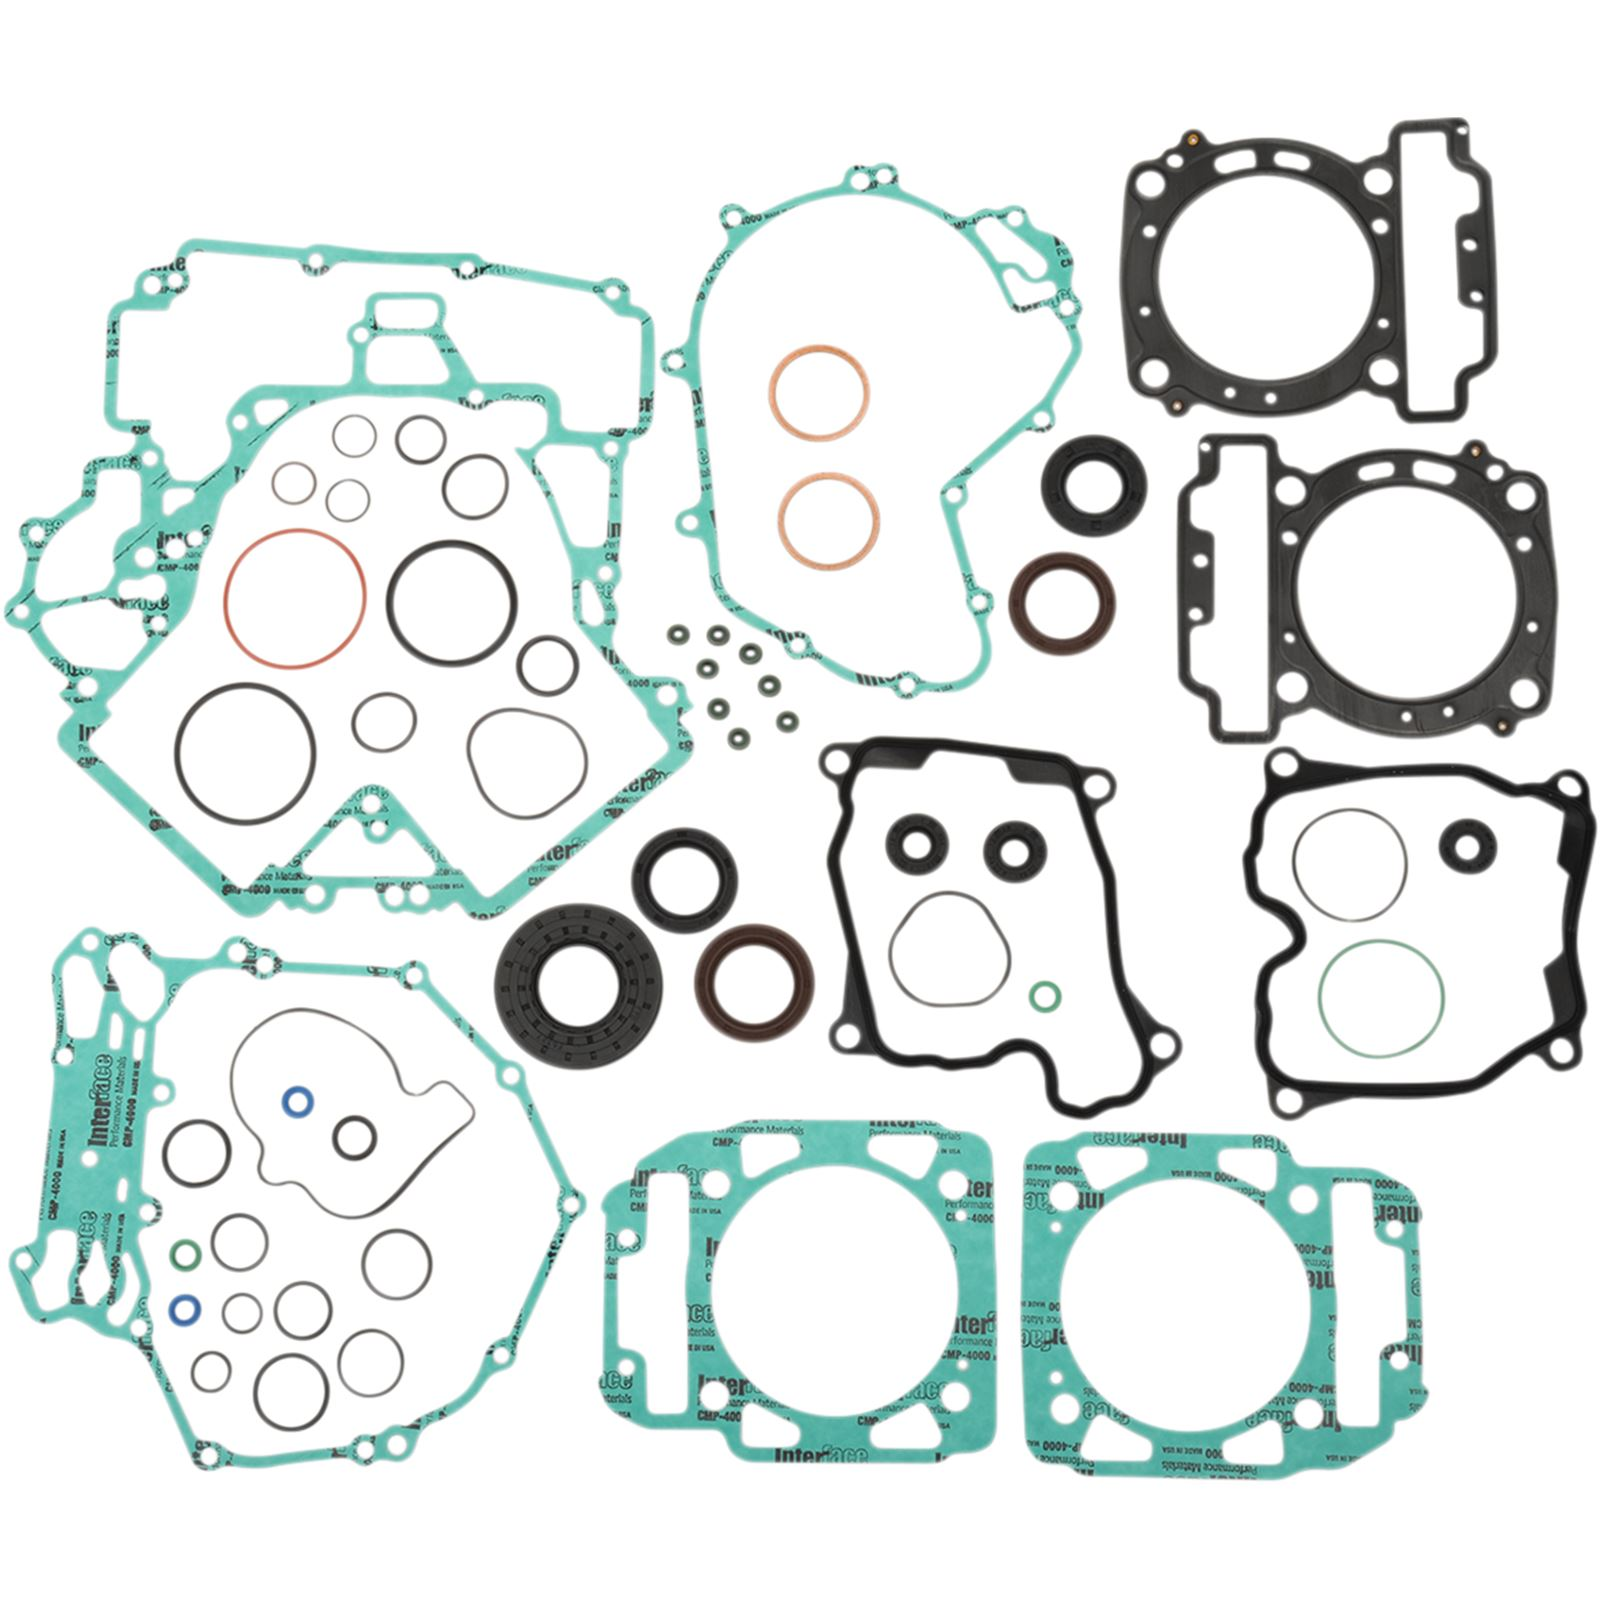 Moose Racing Motor Gasket Kit with Seal Can-Am